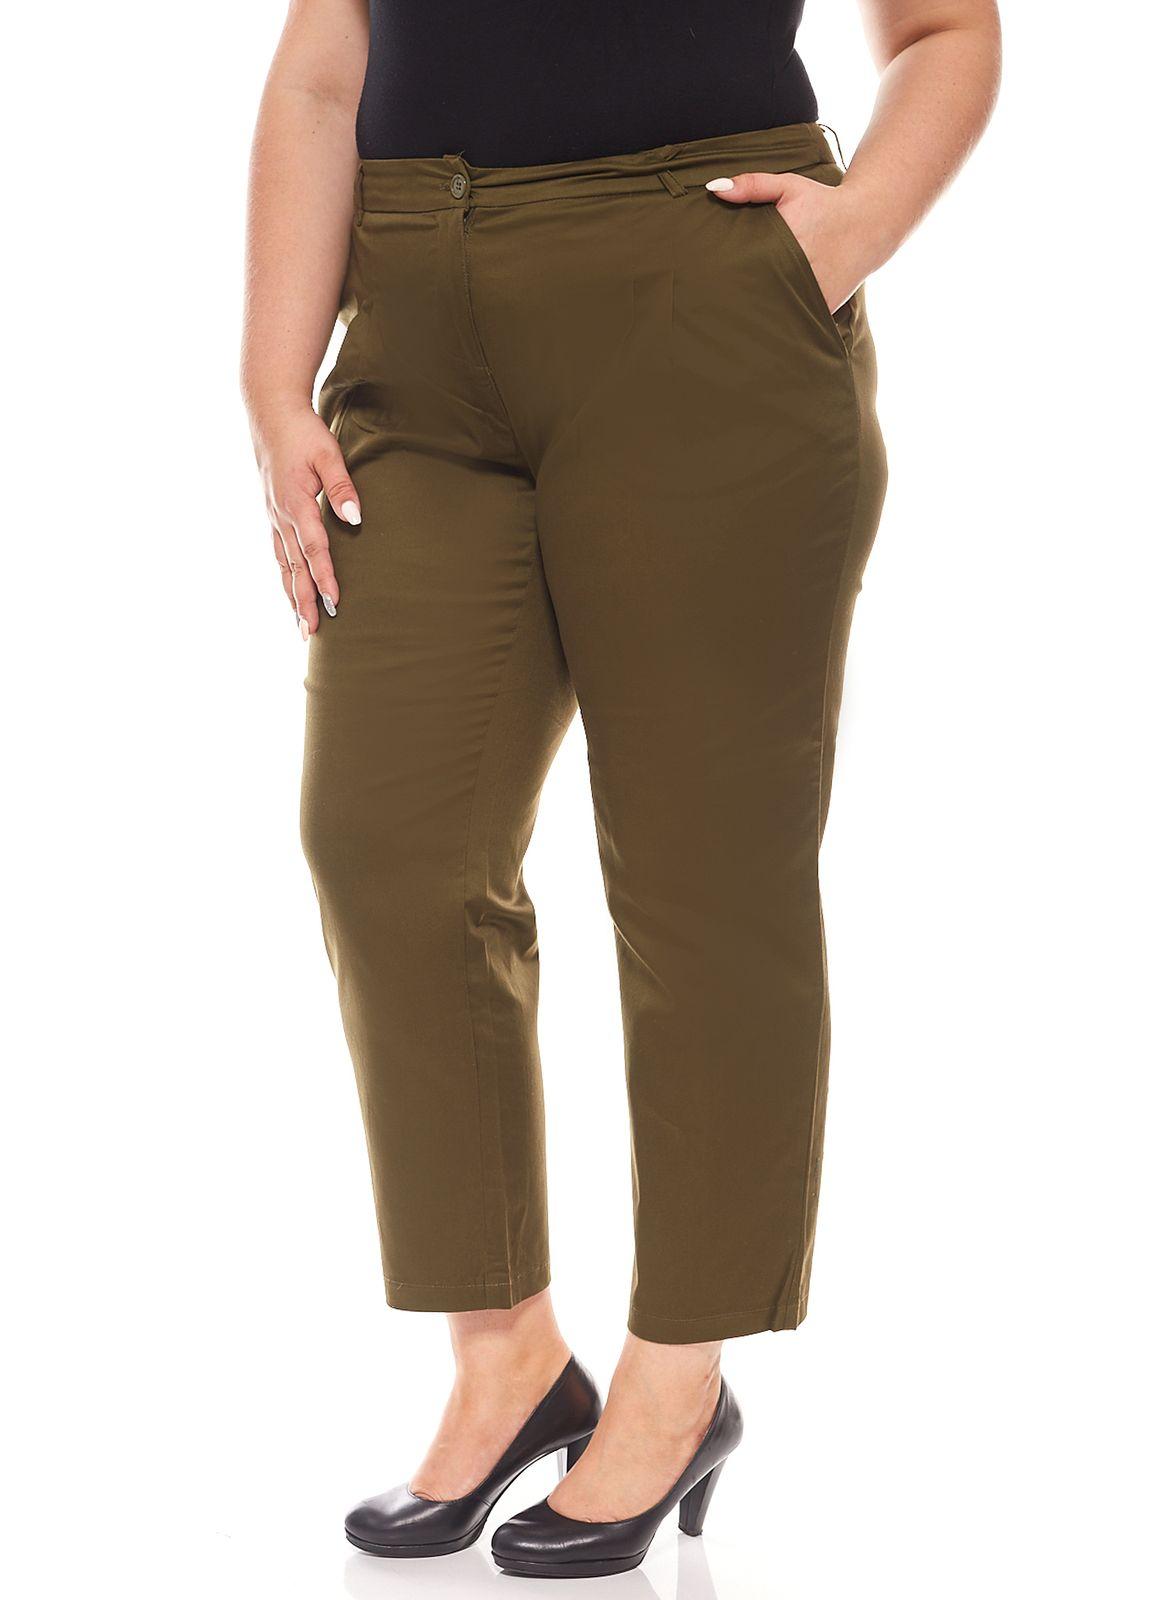 Hose Jeans Damen 7//8 Große Größen Stoffhose Weiß CLASS INTERNATIONAL Slim Fit